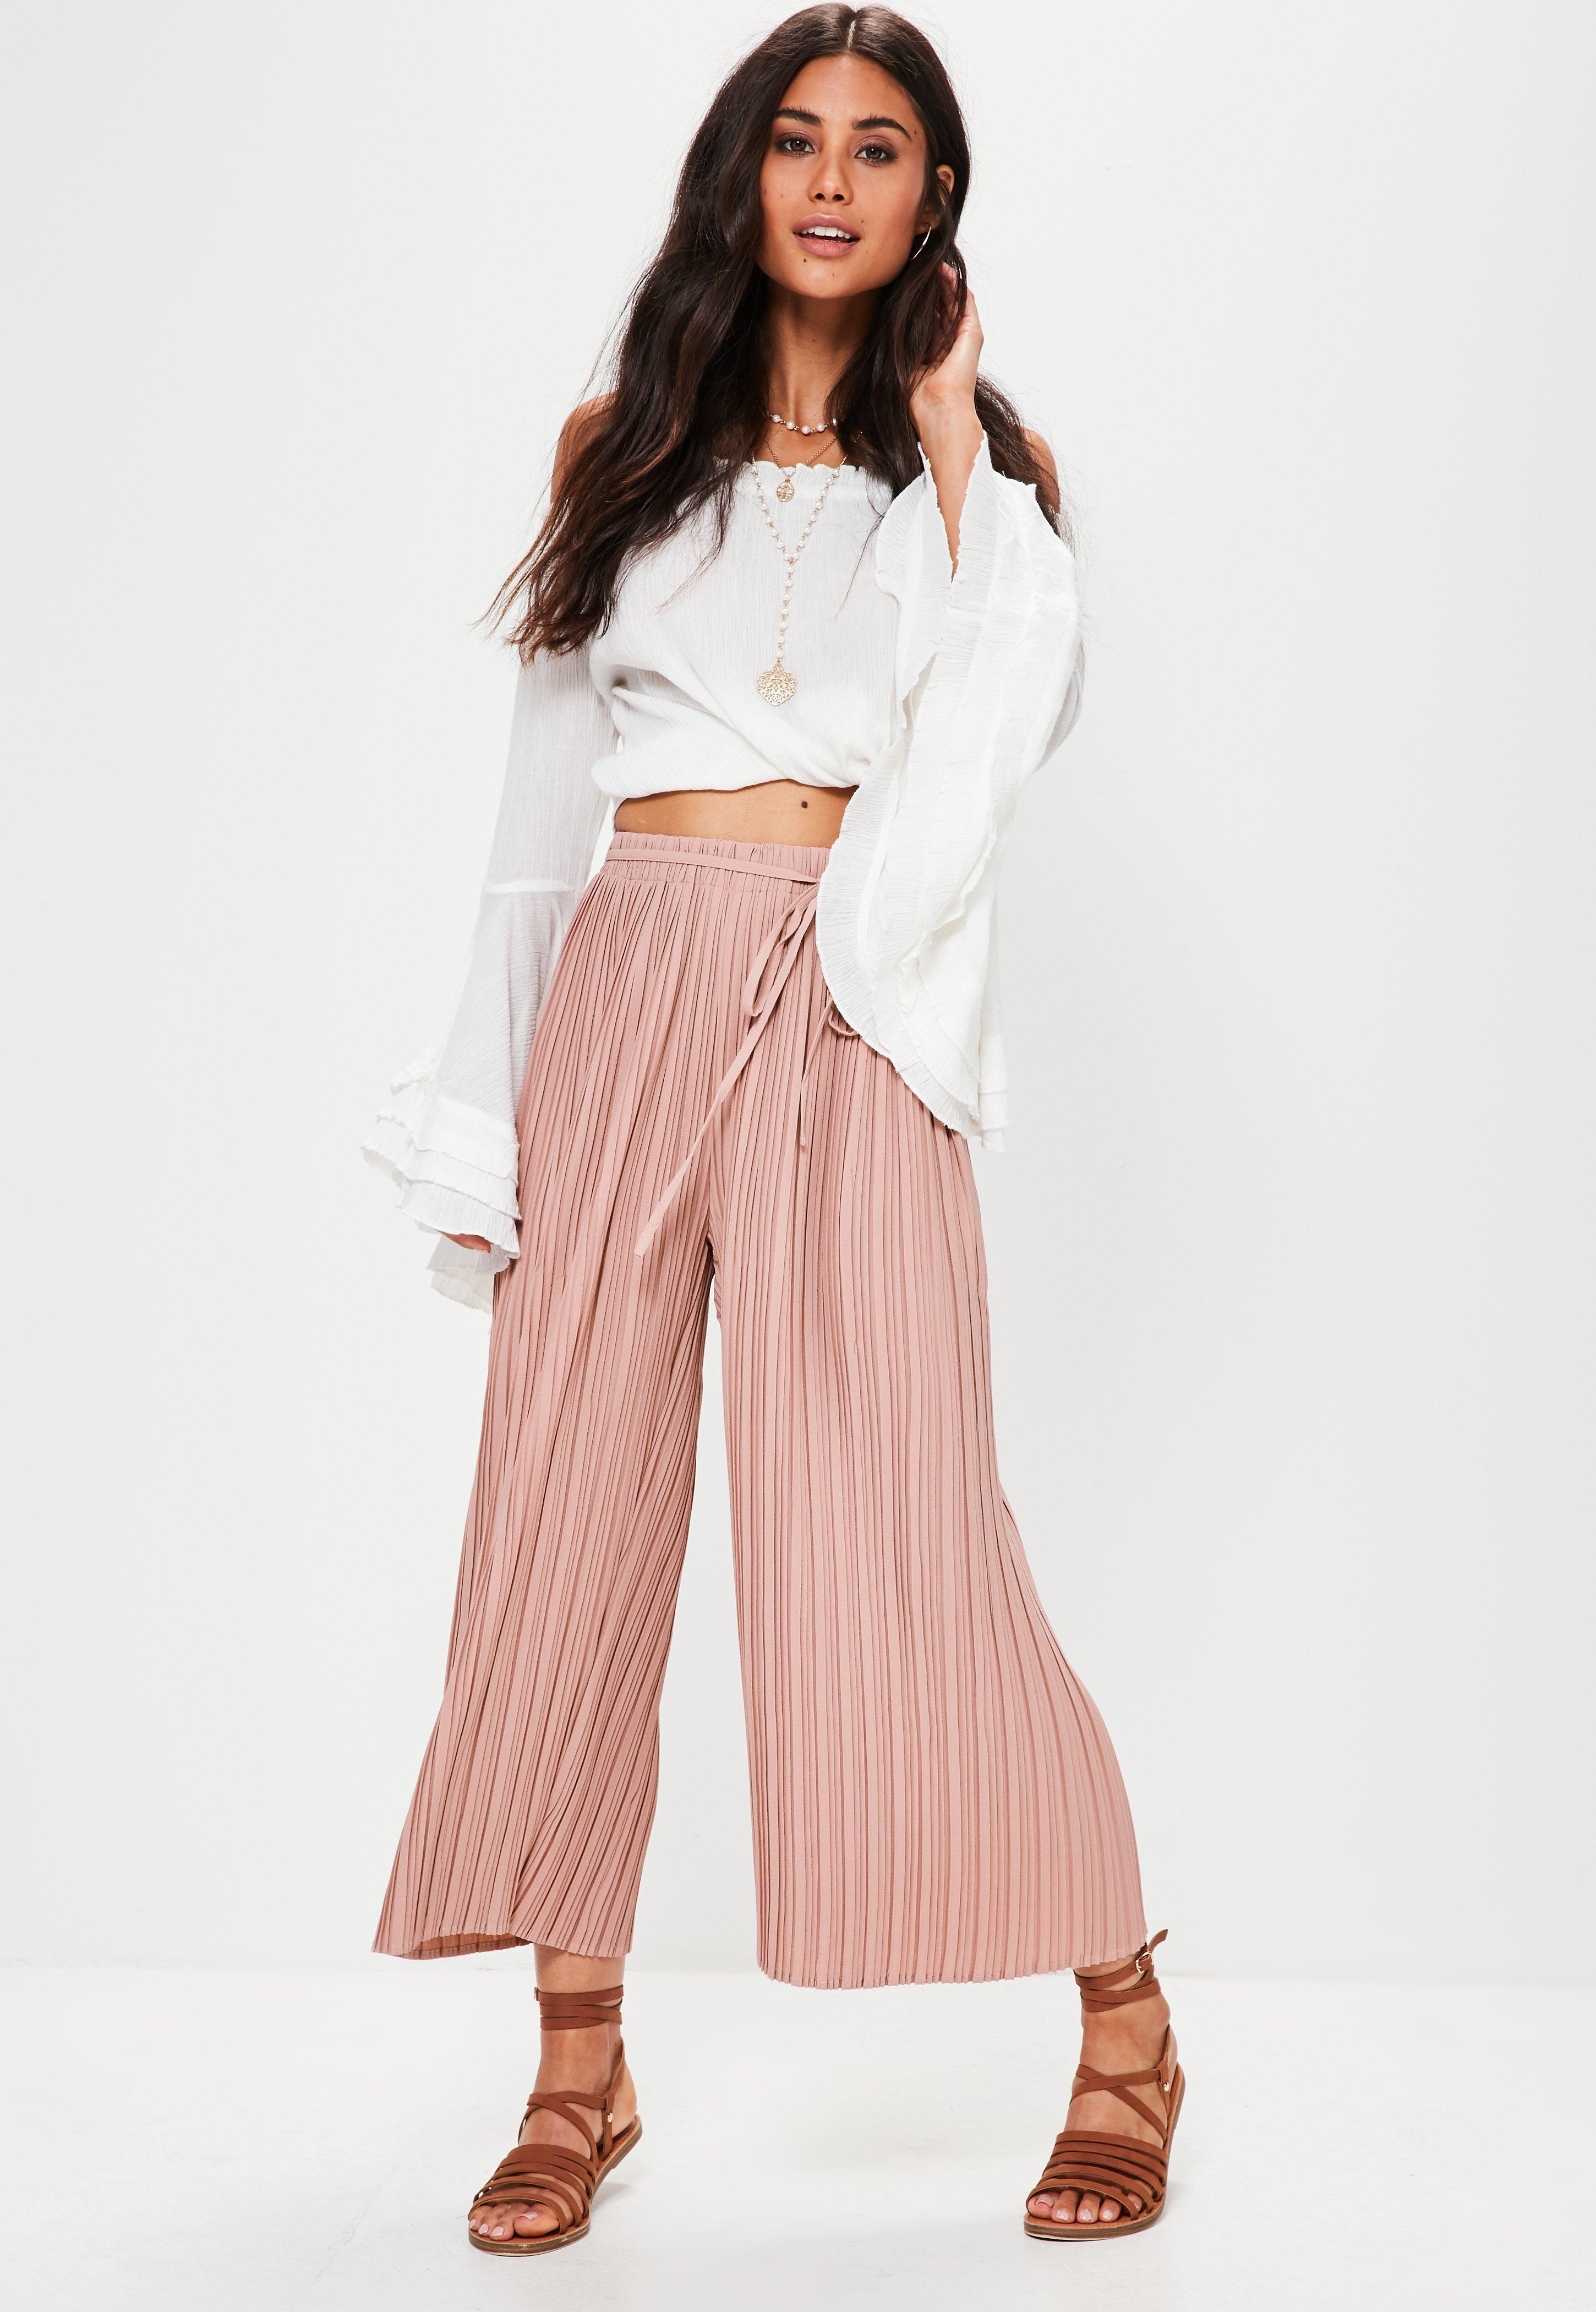 Bekleidung in Petite-Größe online shoppen - Missguided DE